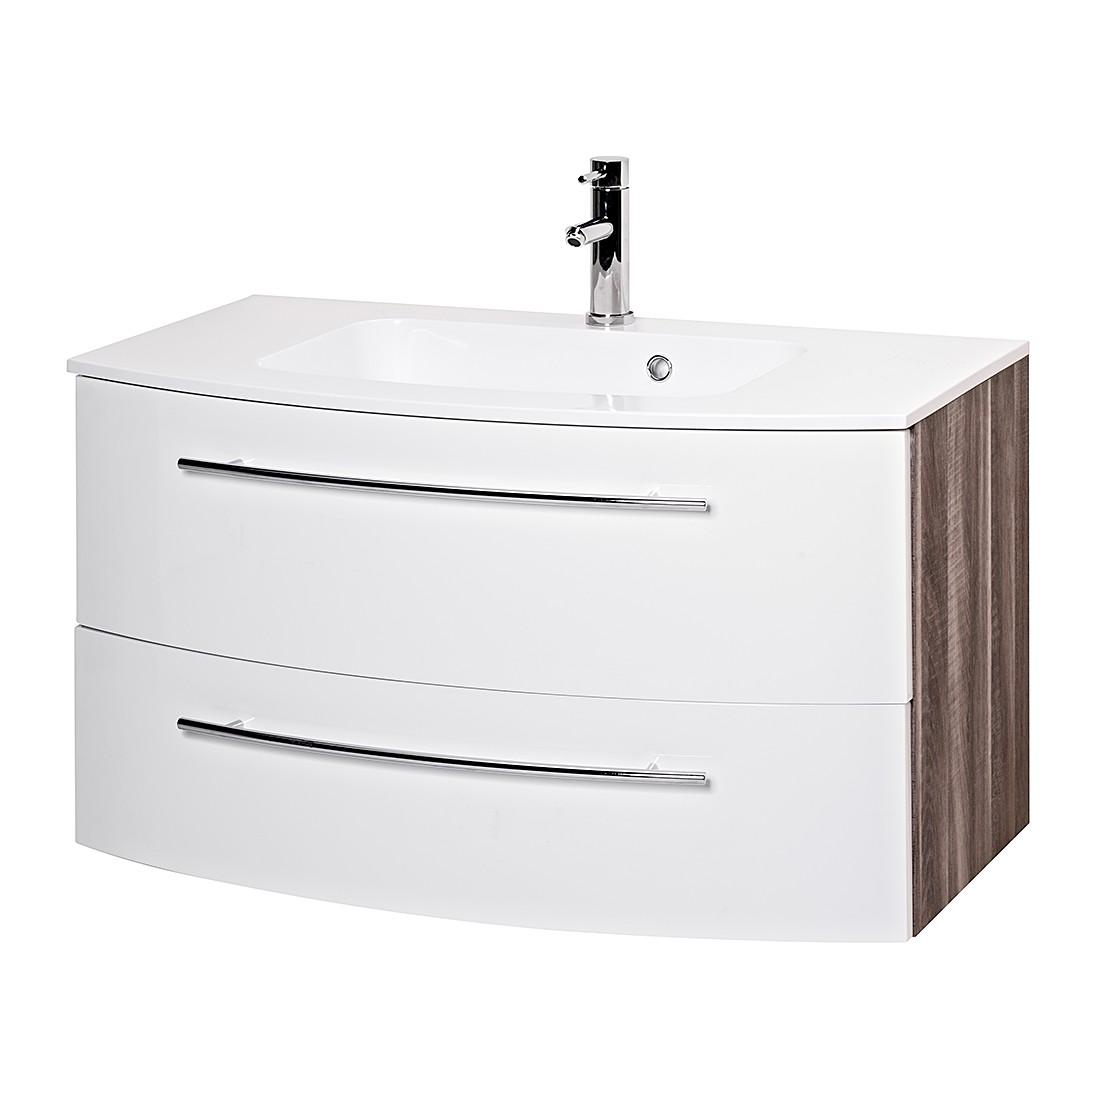 Prix des meuble vasque 32 for Prix meuble vasque